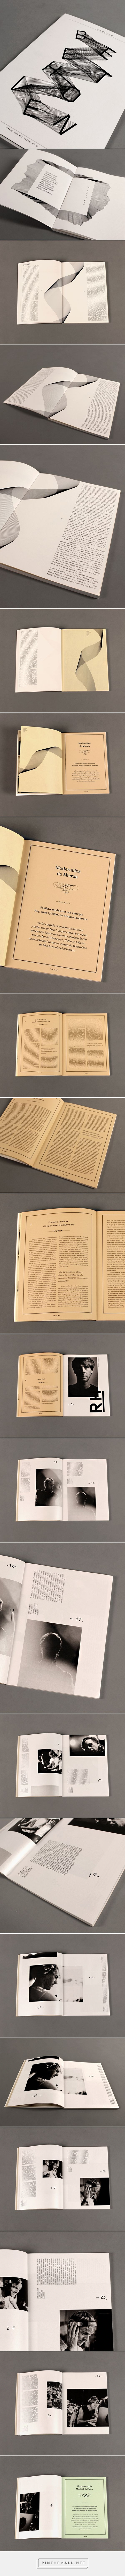 Beethoven Magazine | Manel Portomeñe